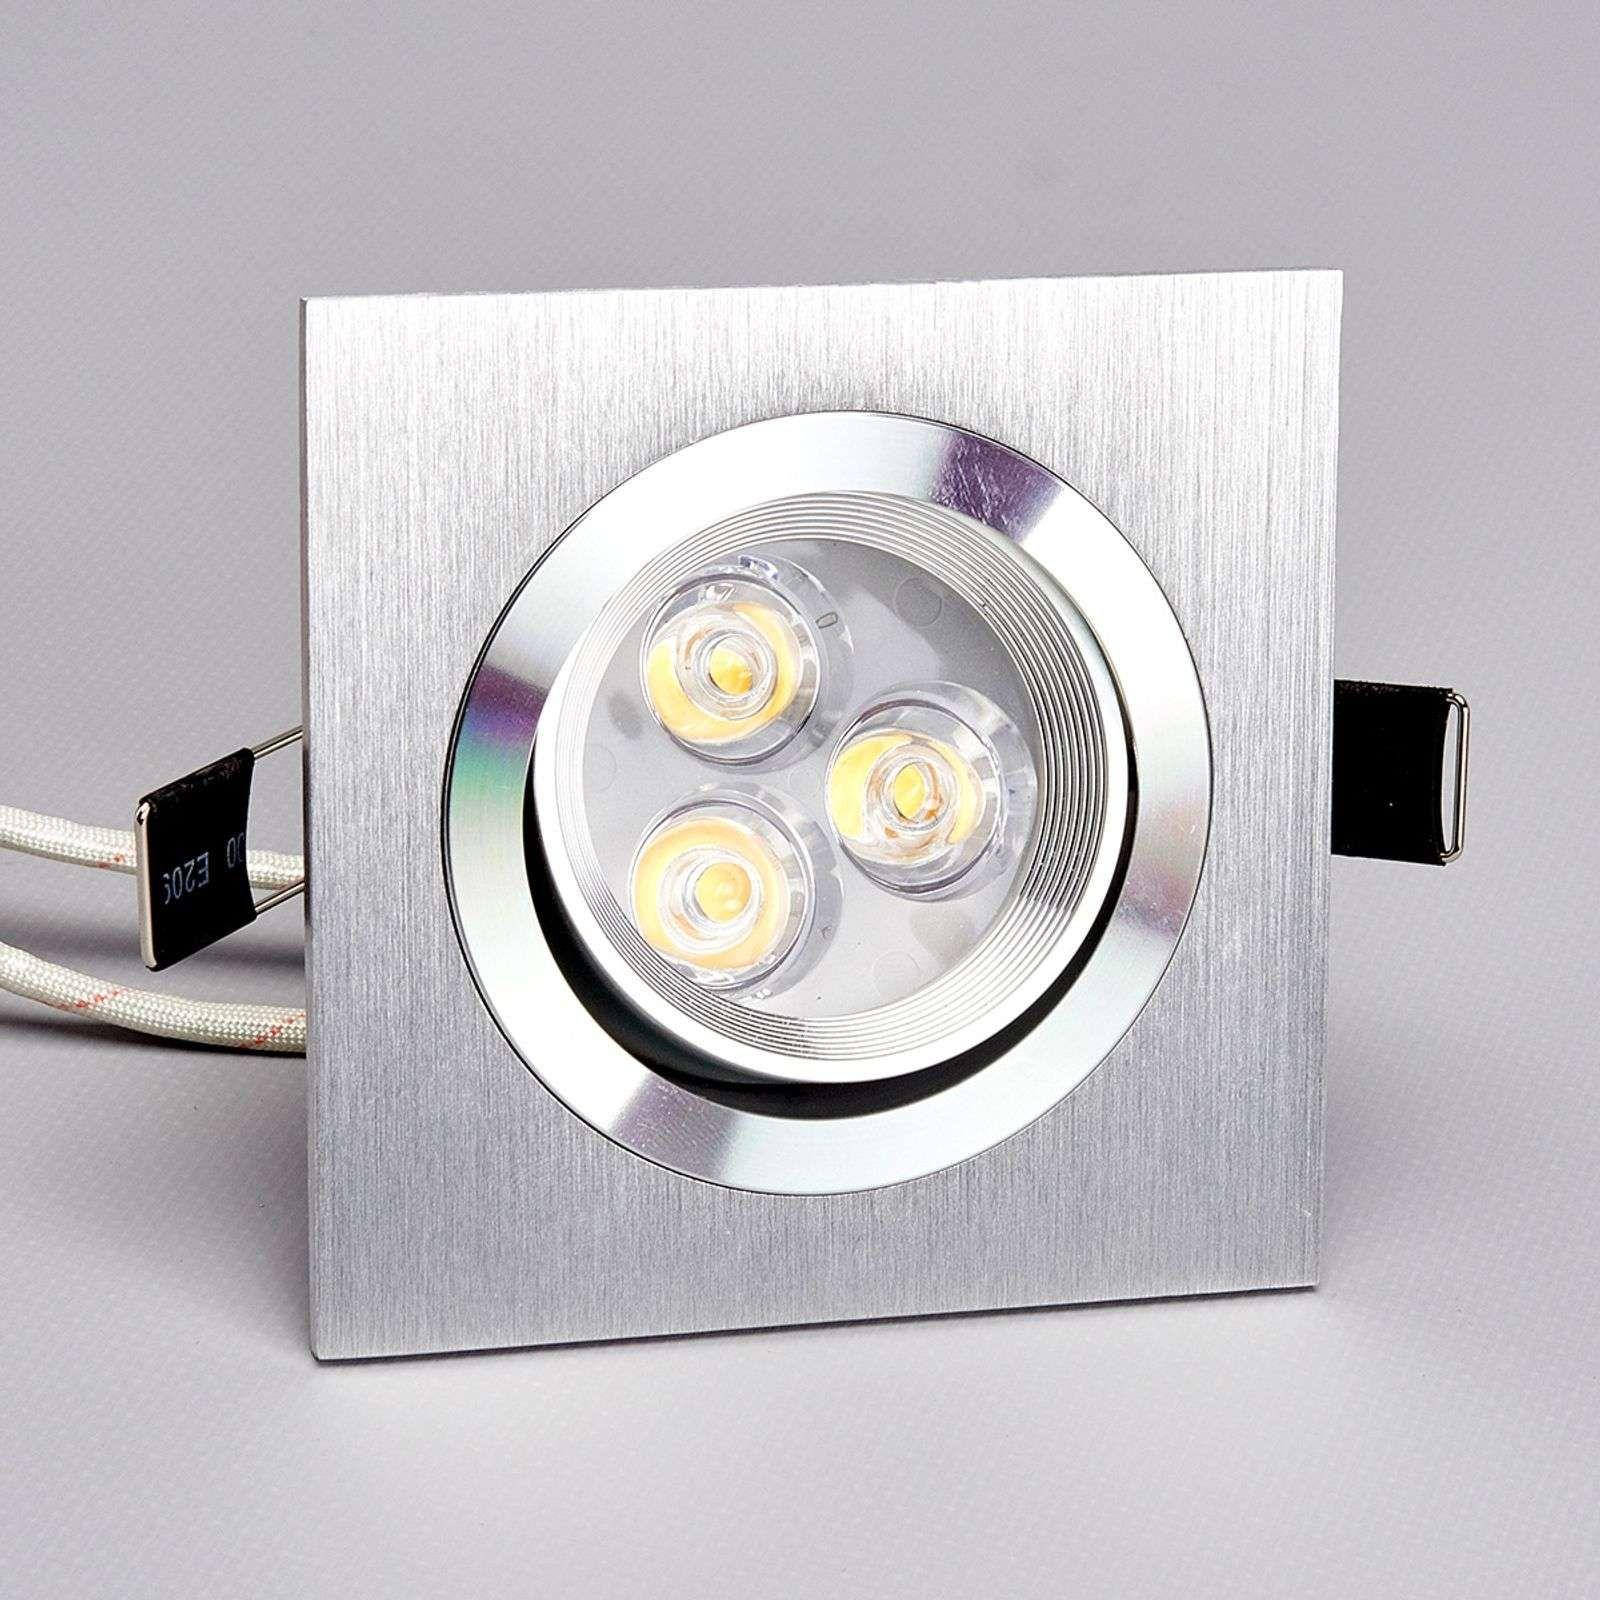 Tjark Spot Carre Encastrable Led En Aluminium En 2020 Led Lampe Led Et Spot Encastrable